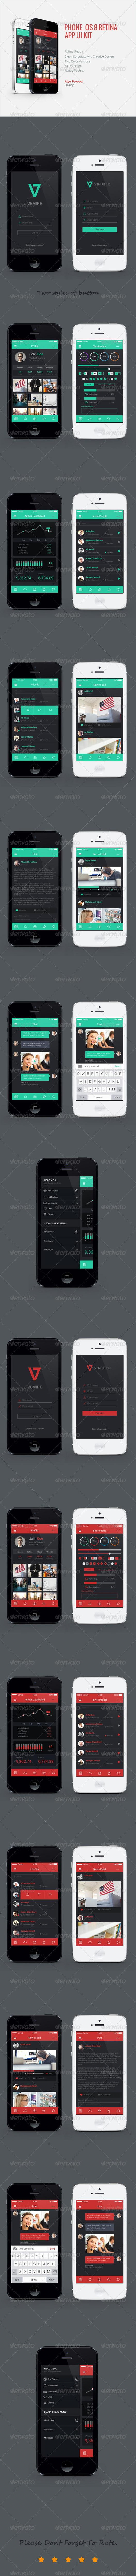 GraphicRiver iPHONE iOS 8 App UI Kit 8097806